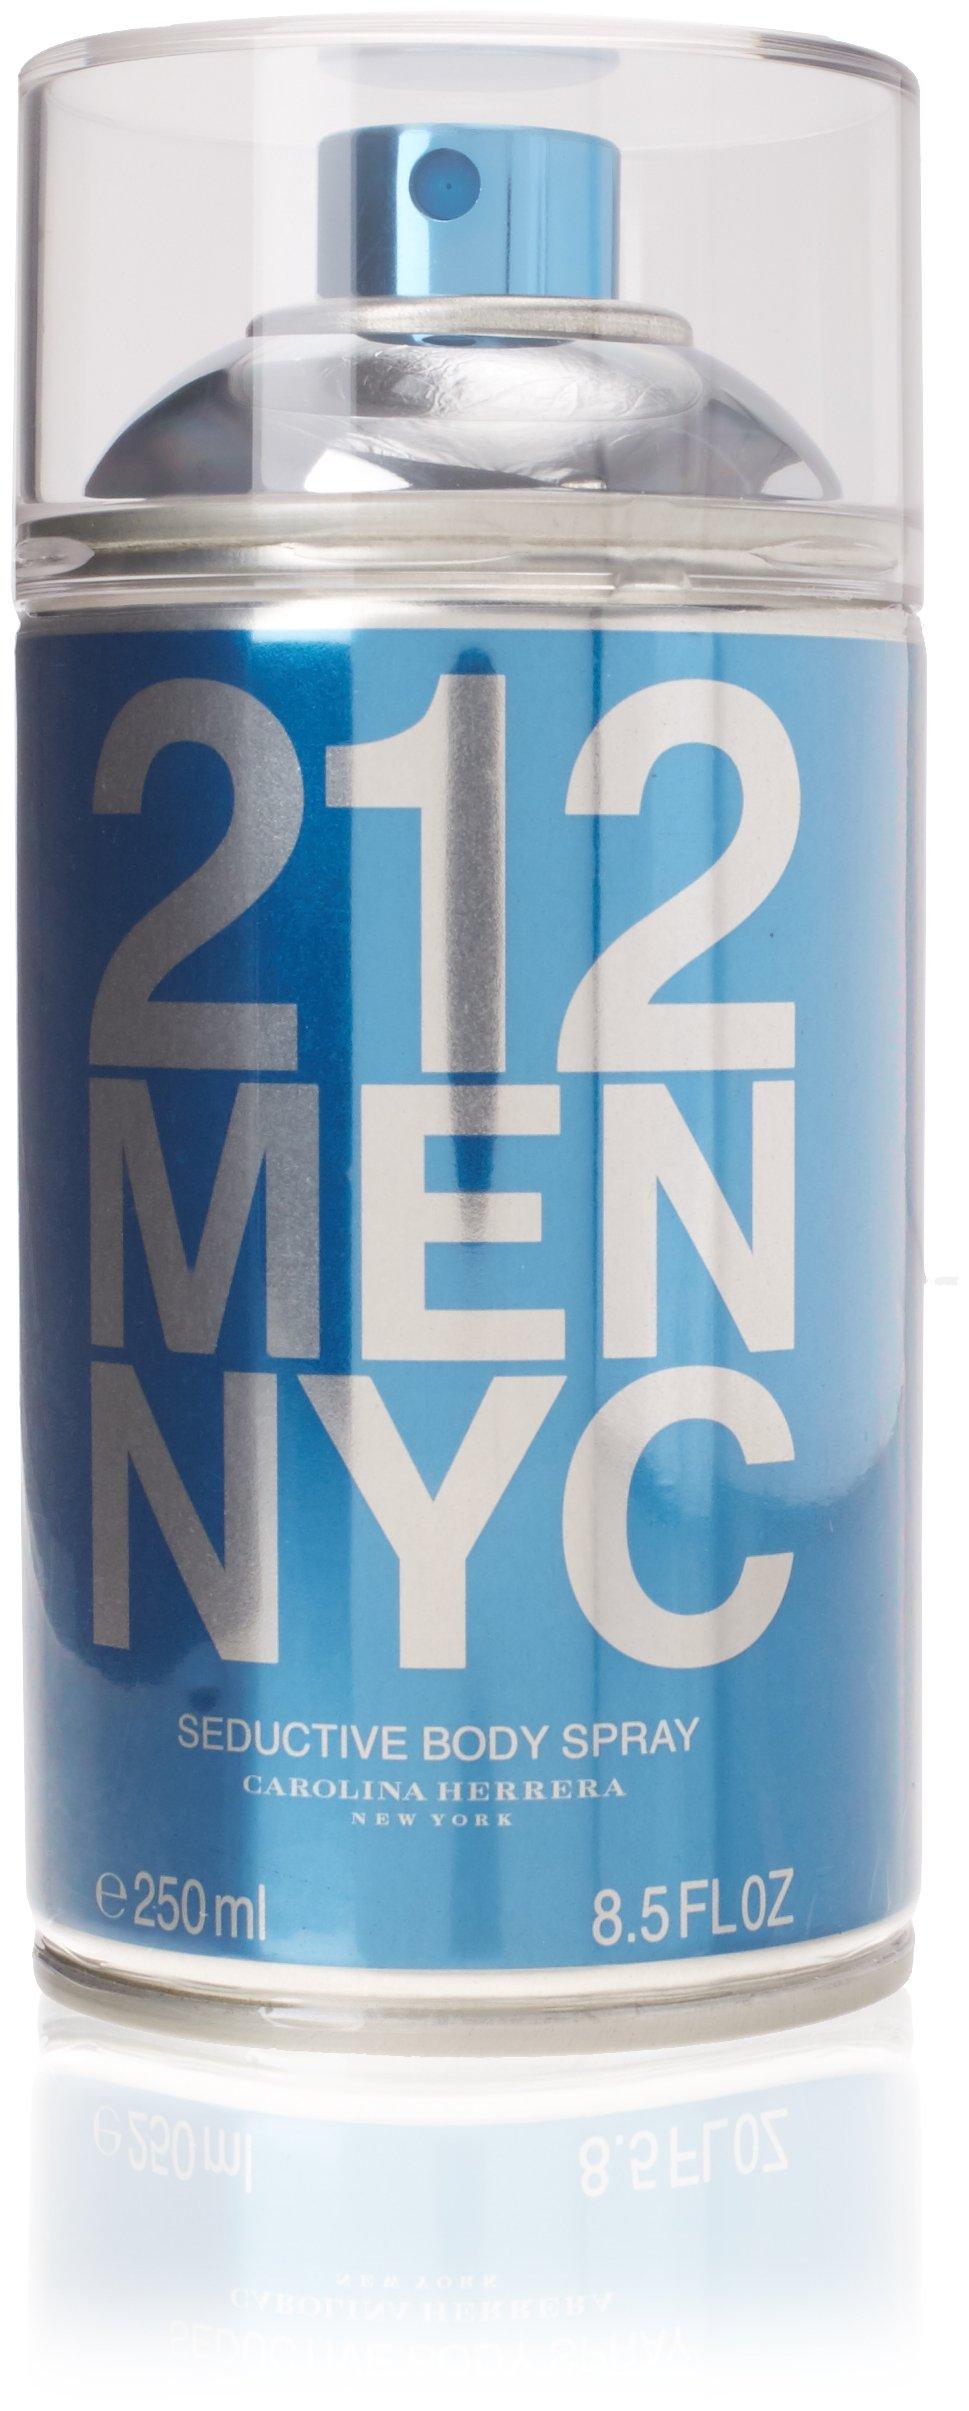 Carolina Herrera 212 Men Body Spray 8.5oz (250ml)